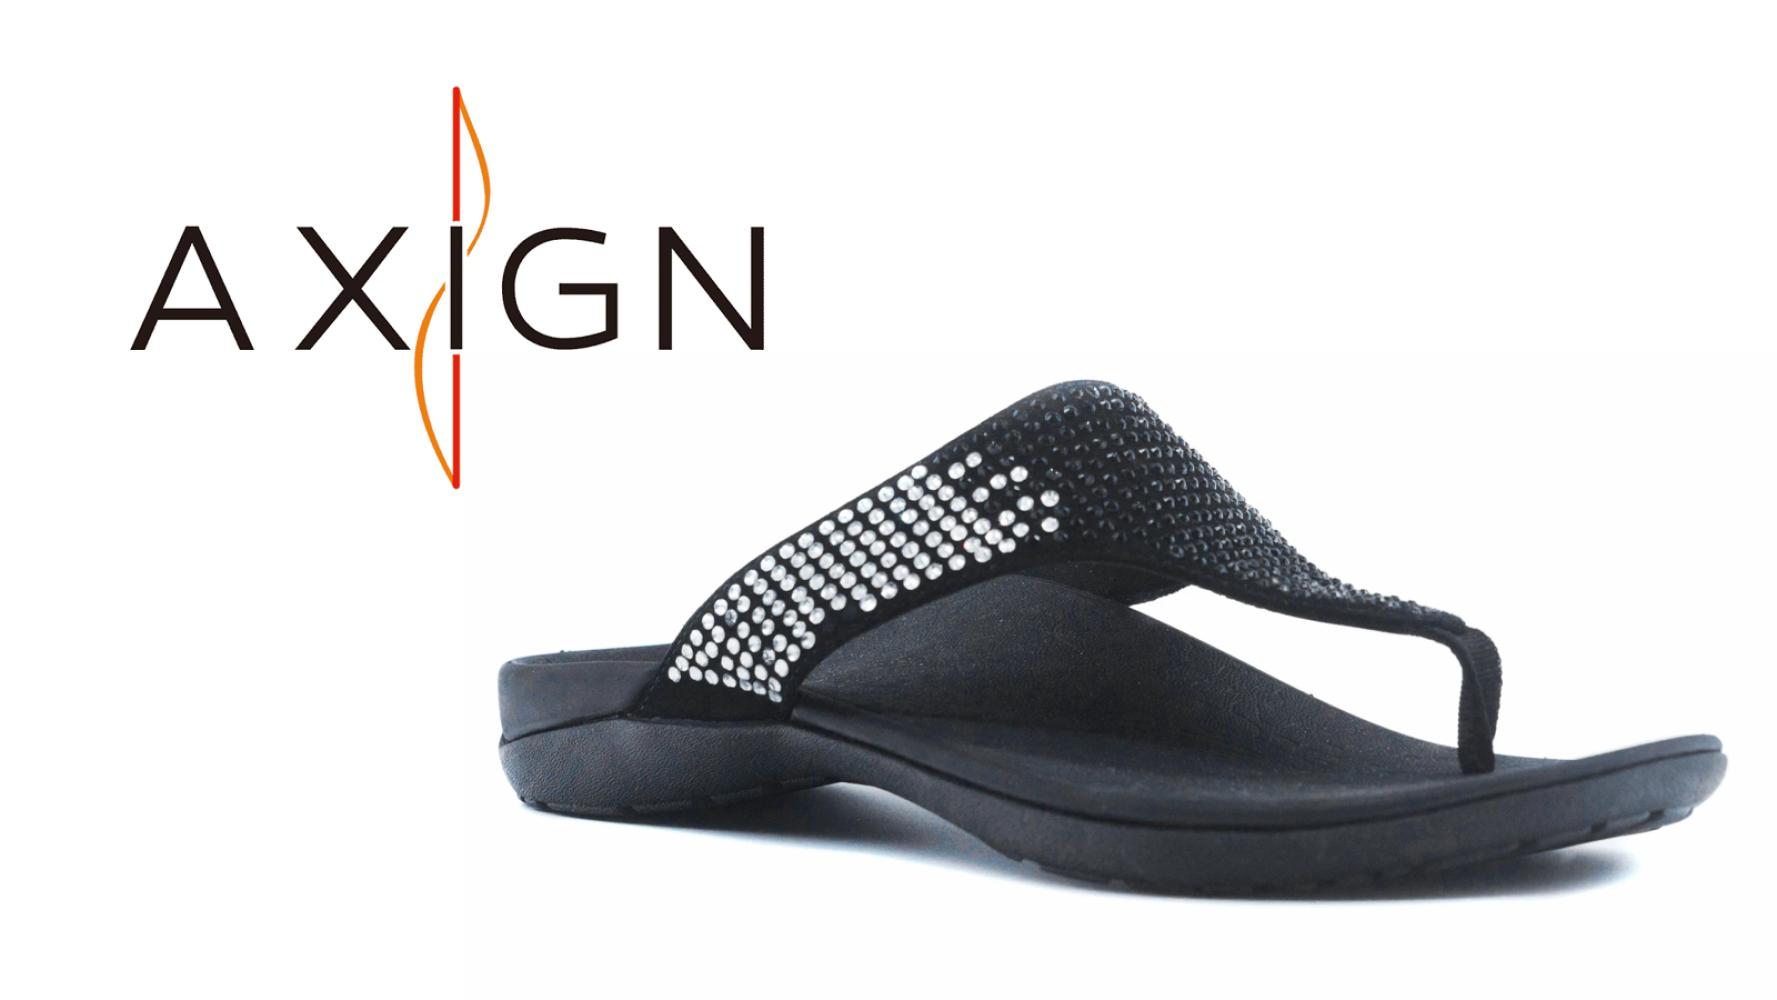 AXIGN ALEXA FlipFlops Stylish Sandals